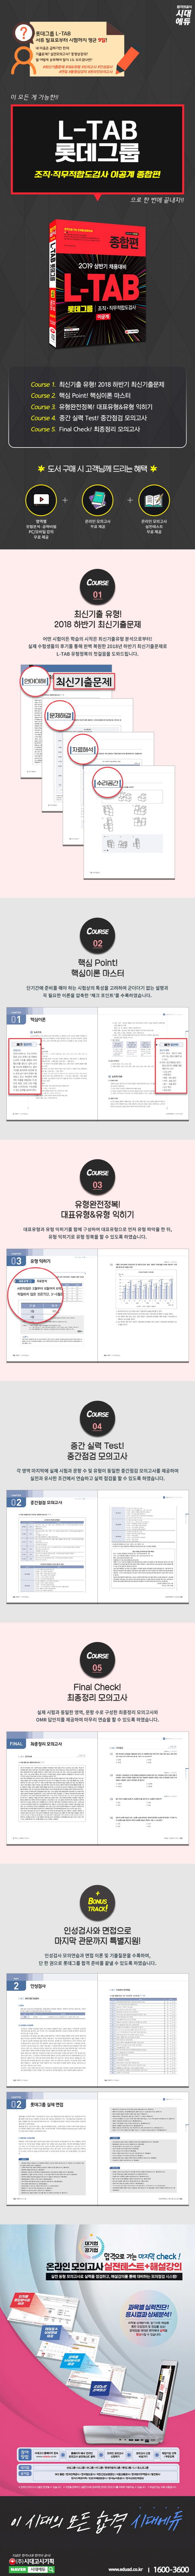 L-TAB 롯데그룹 조직 직무적합도검사 이공계 종합편(2019)(합격공식) 도서 상세이미지